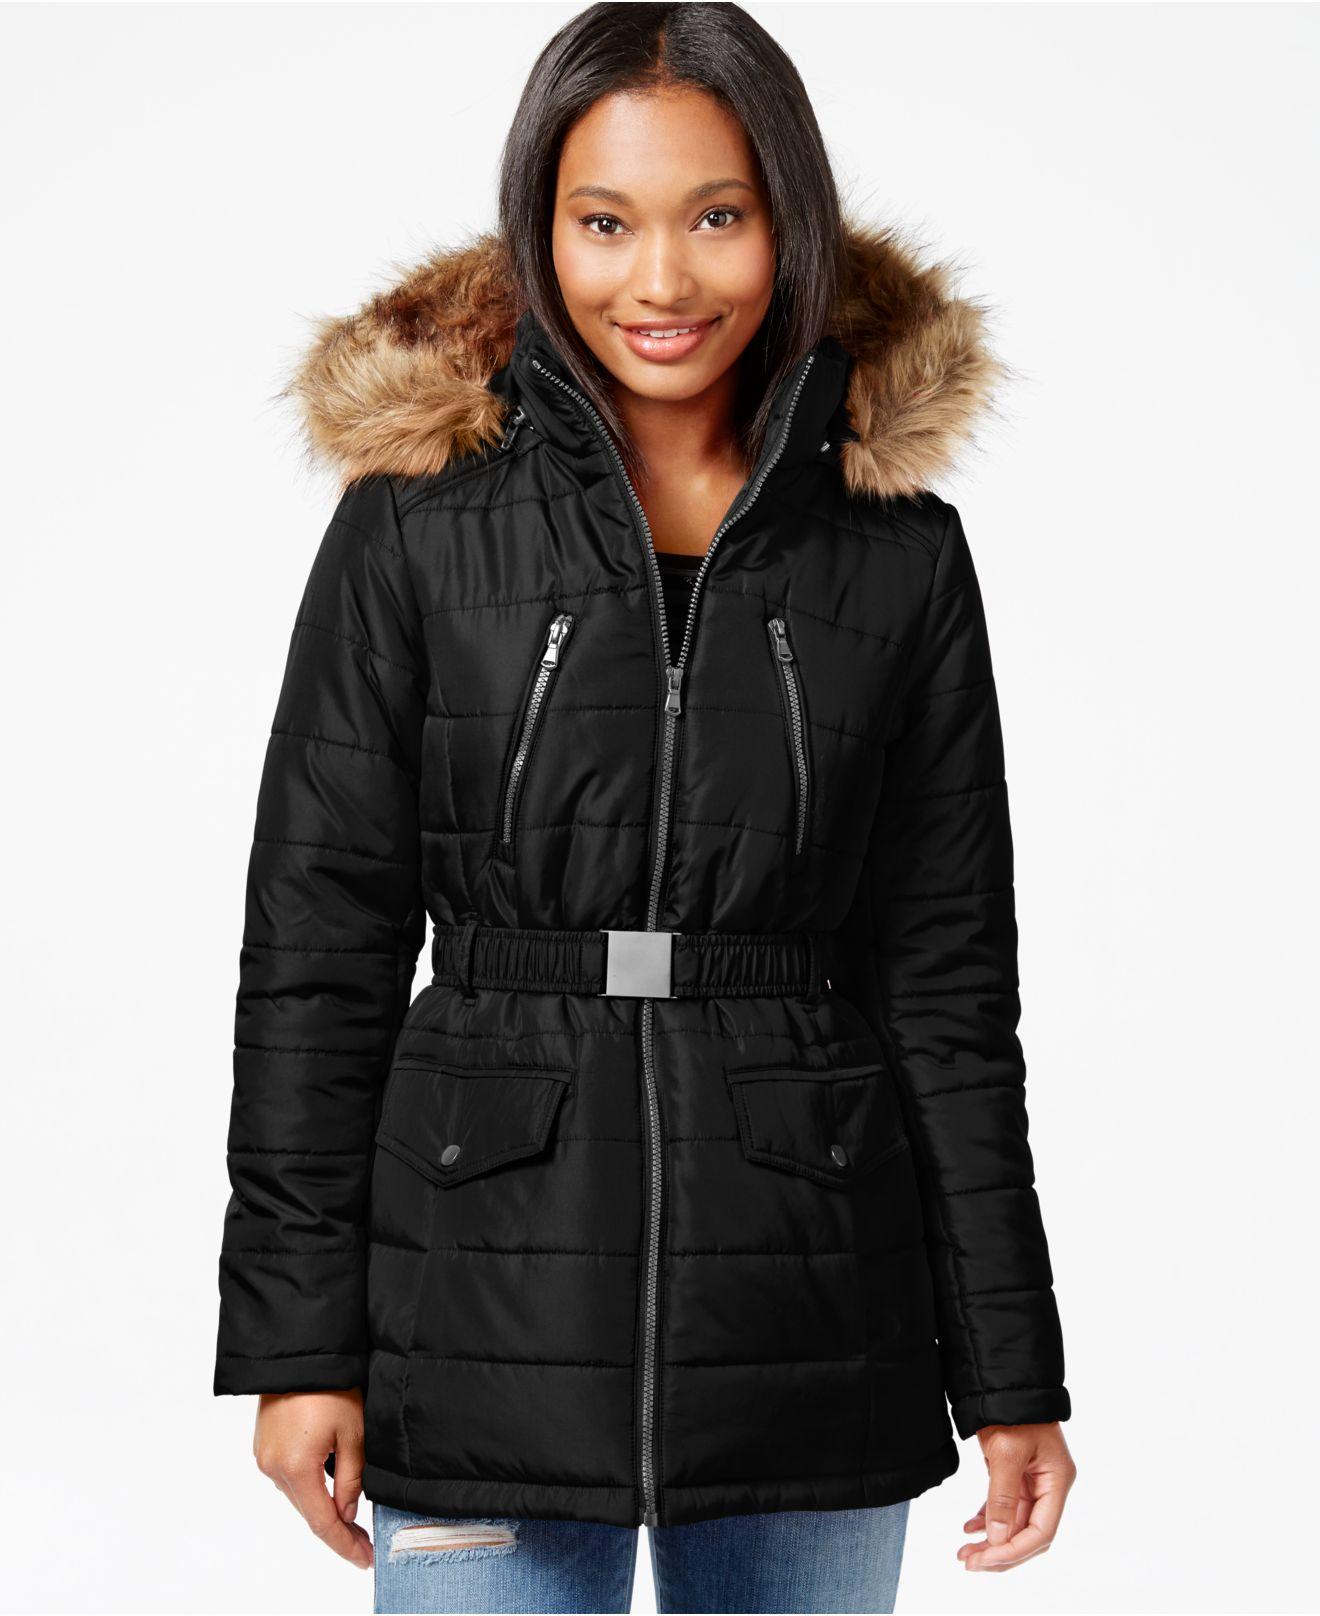 Amazon.com: Fox Full Hood Animal Hat Faux Fur 3 In1 ...